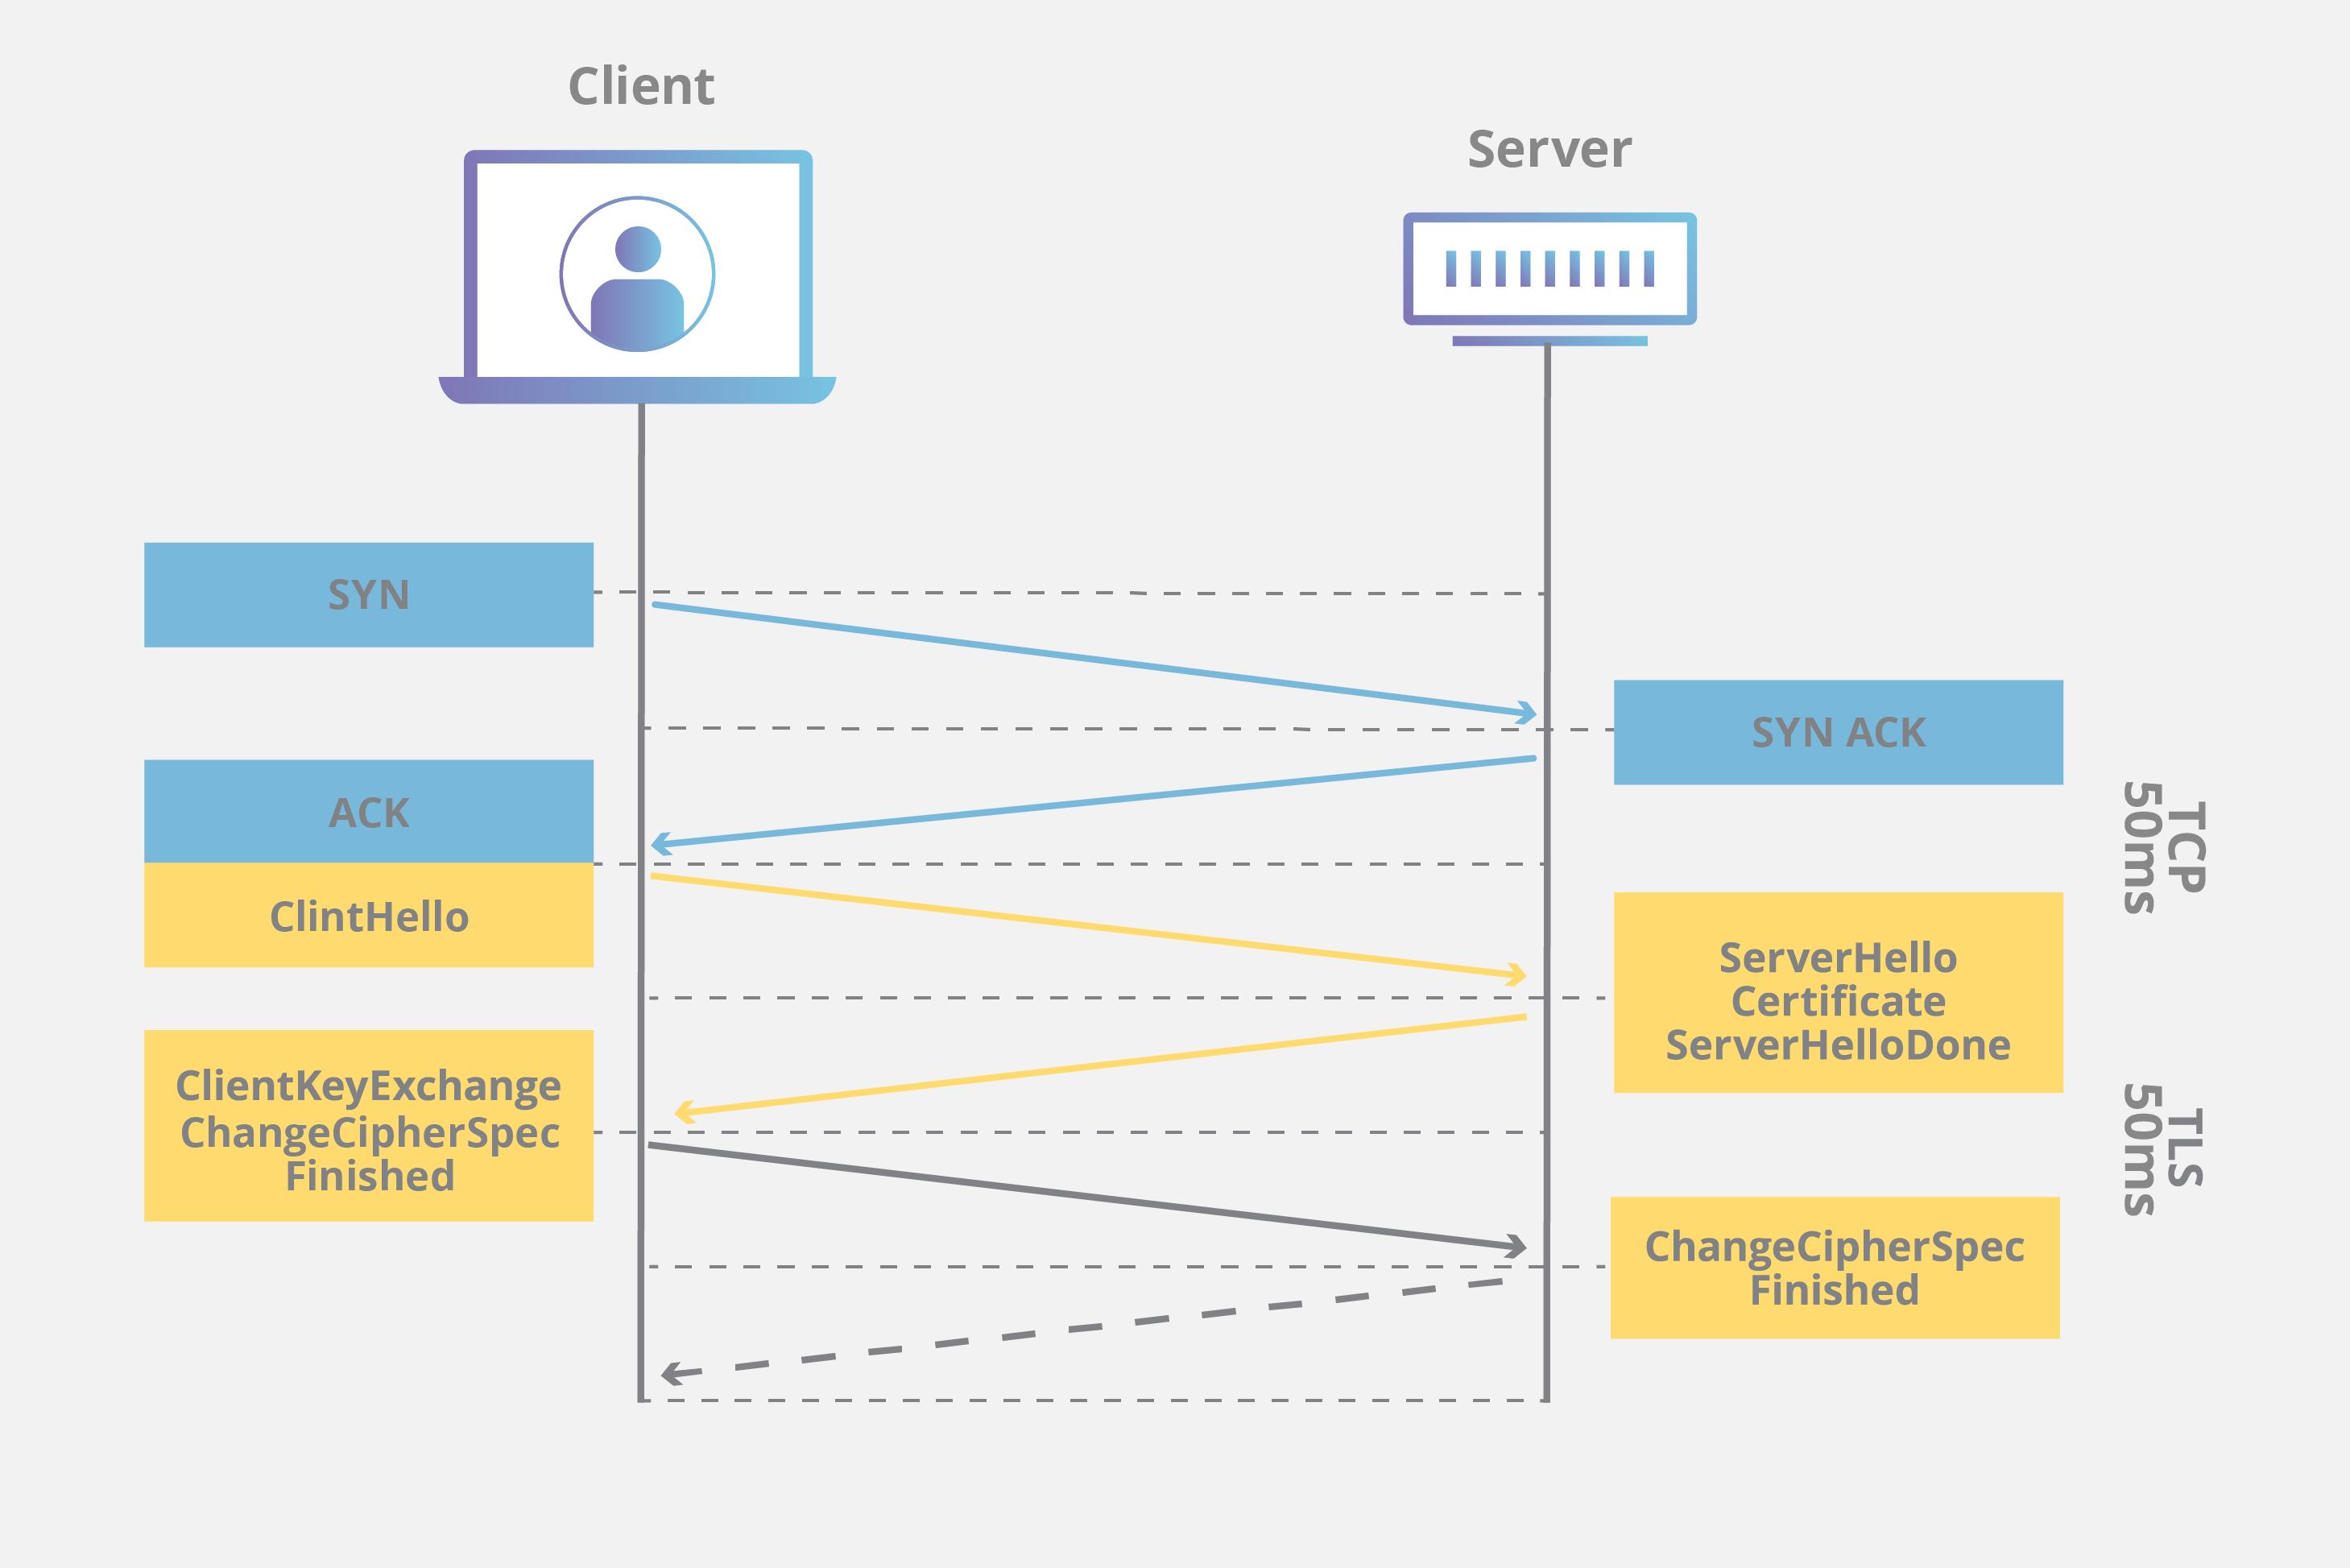 tcp three way handshake diagram ademco vista 10p wiring cdn ssl tls security cloudflare